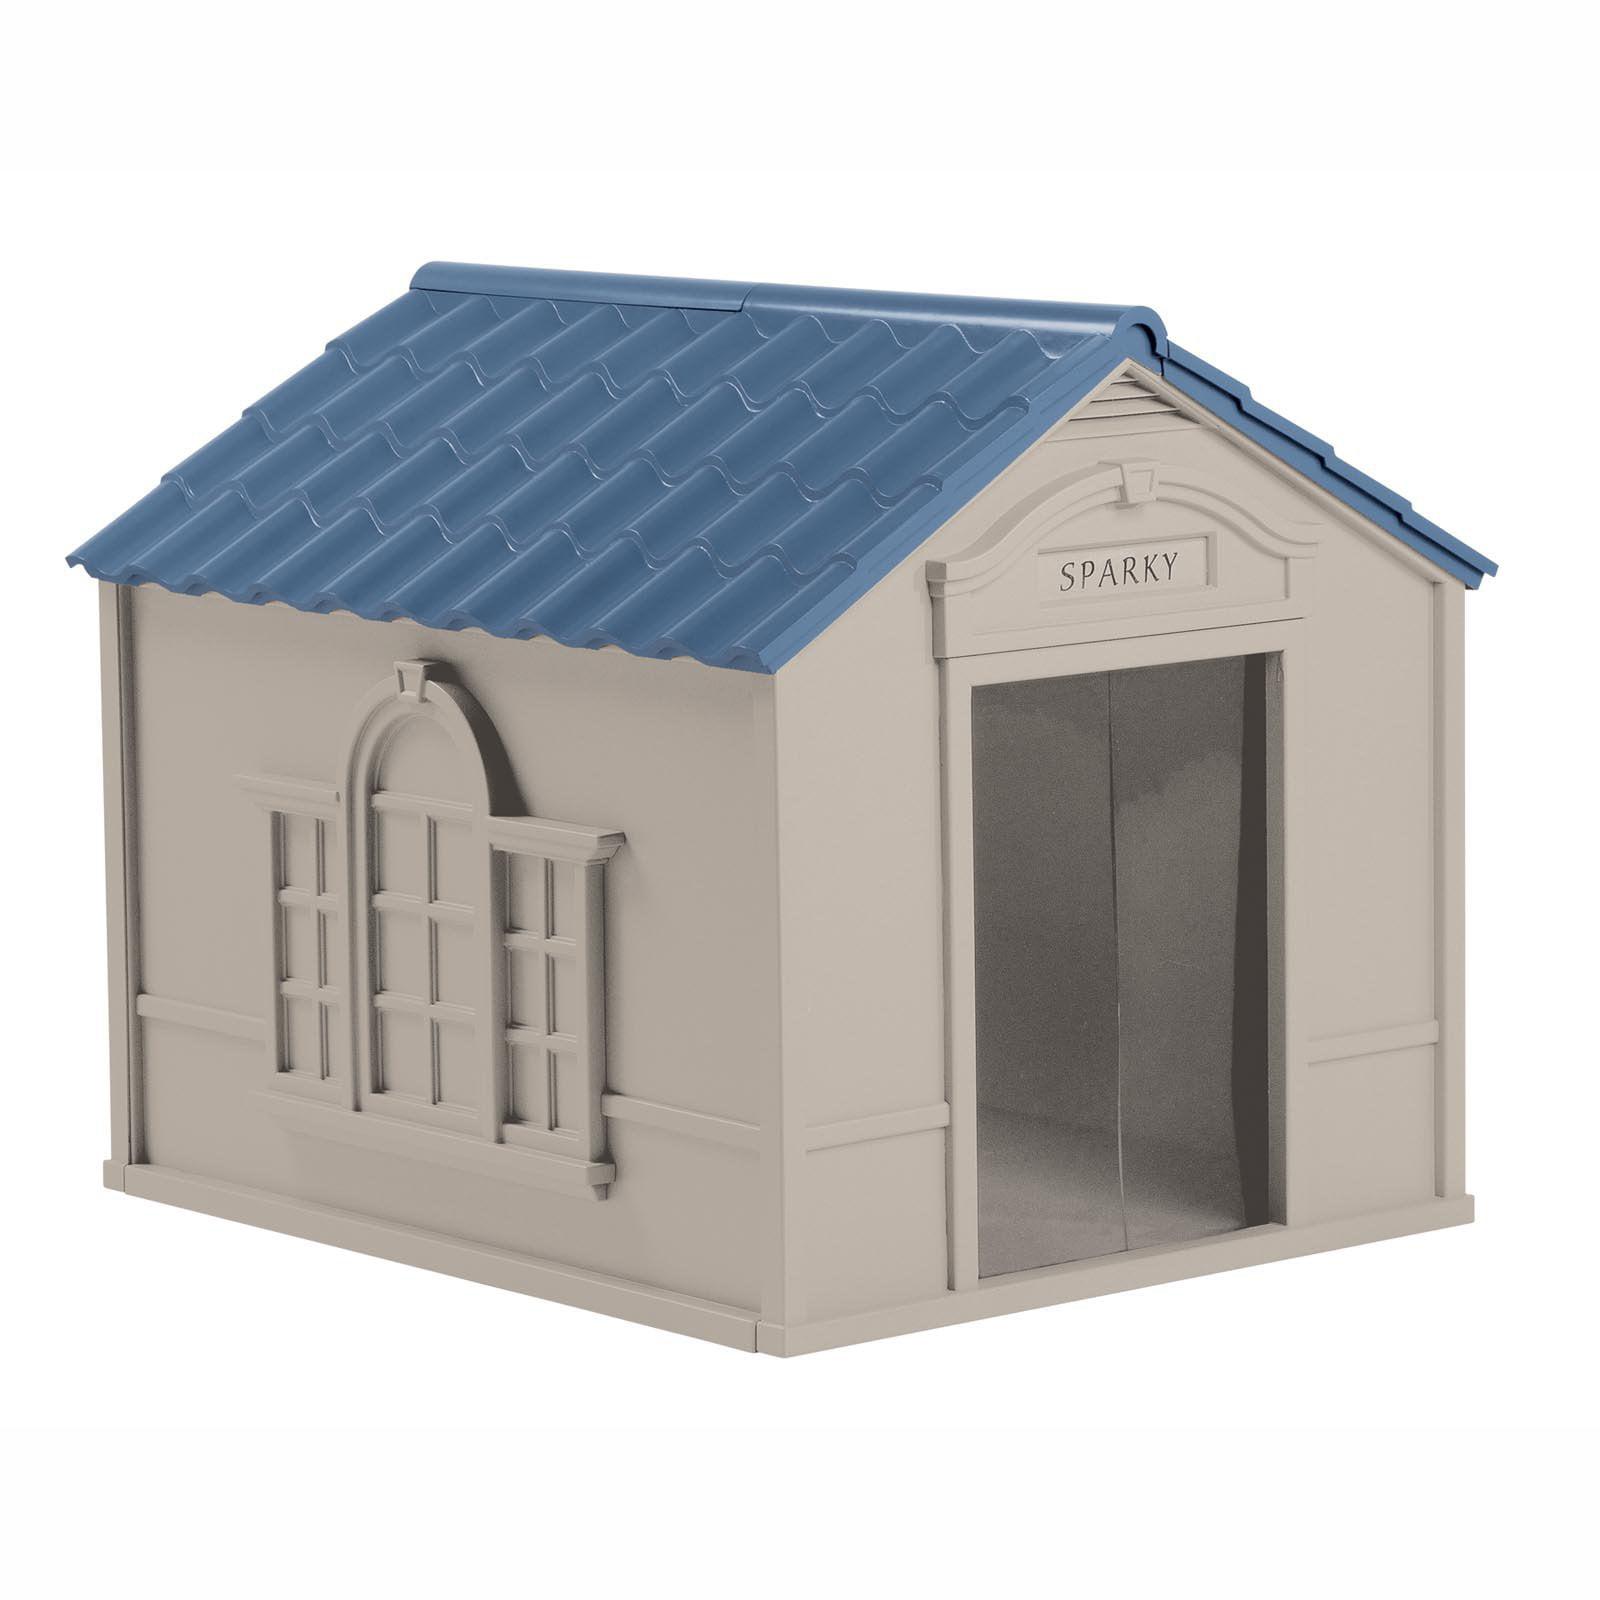 Suncast Deluxe Dog House, DH350   Walmart.com